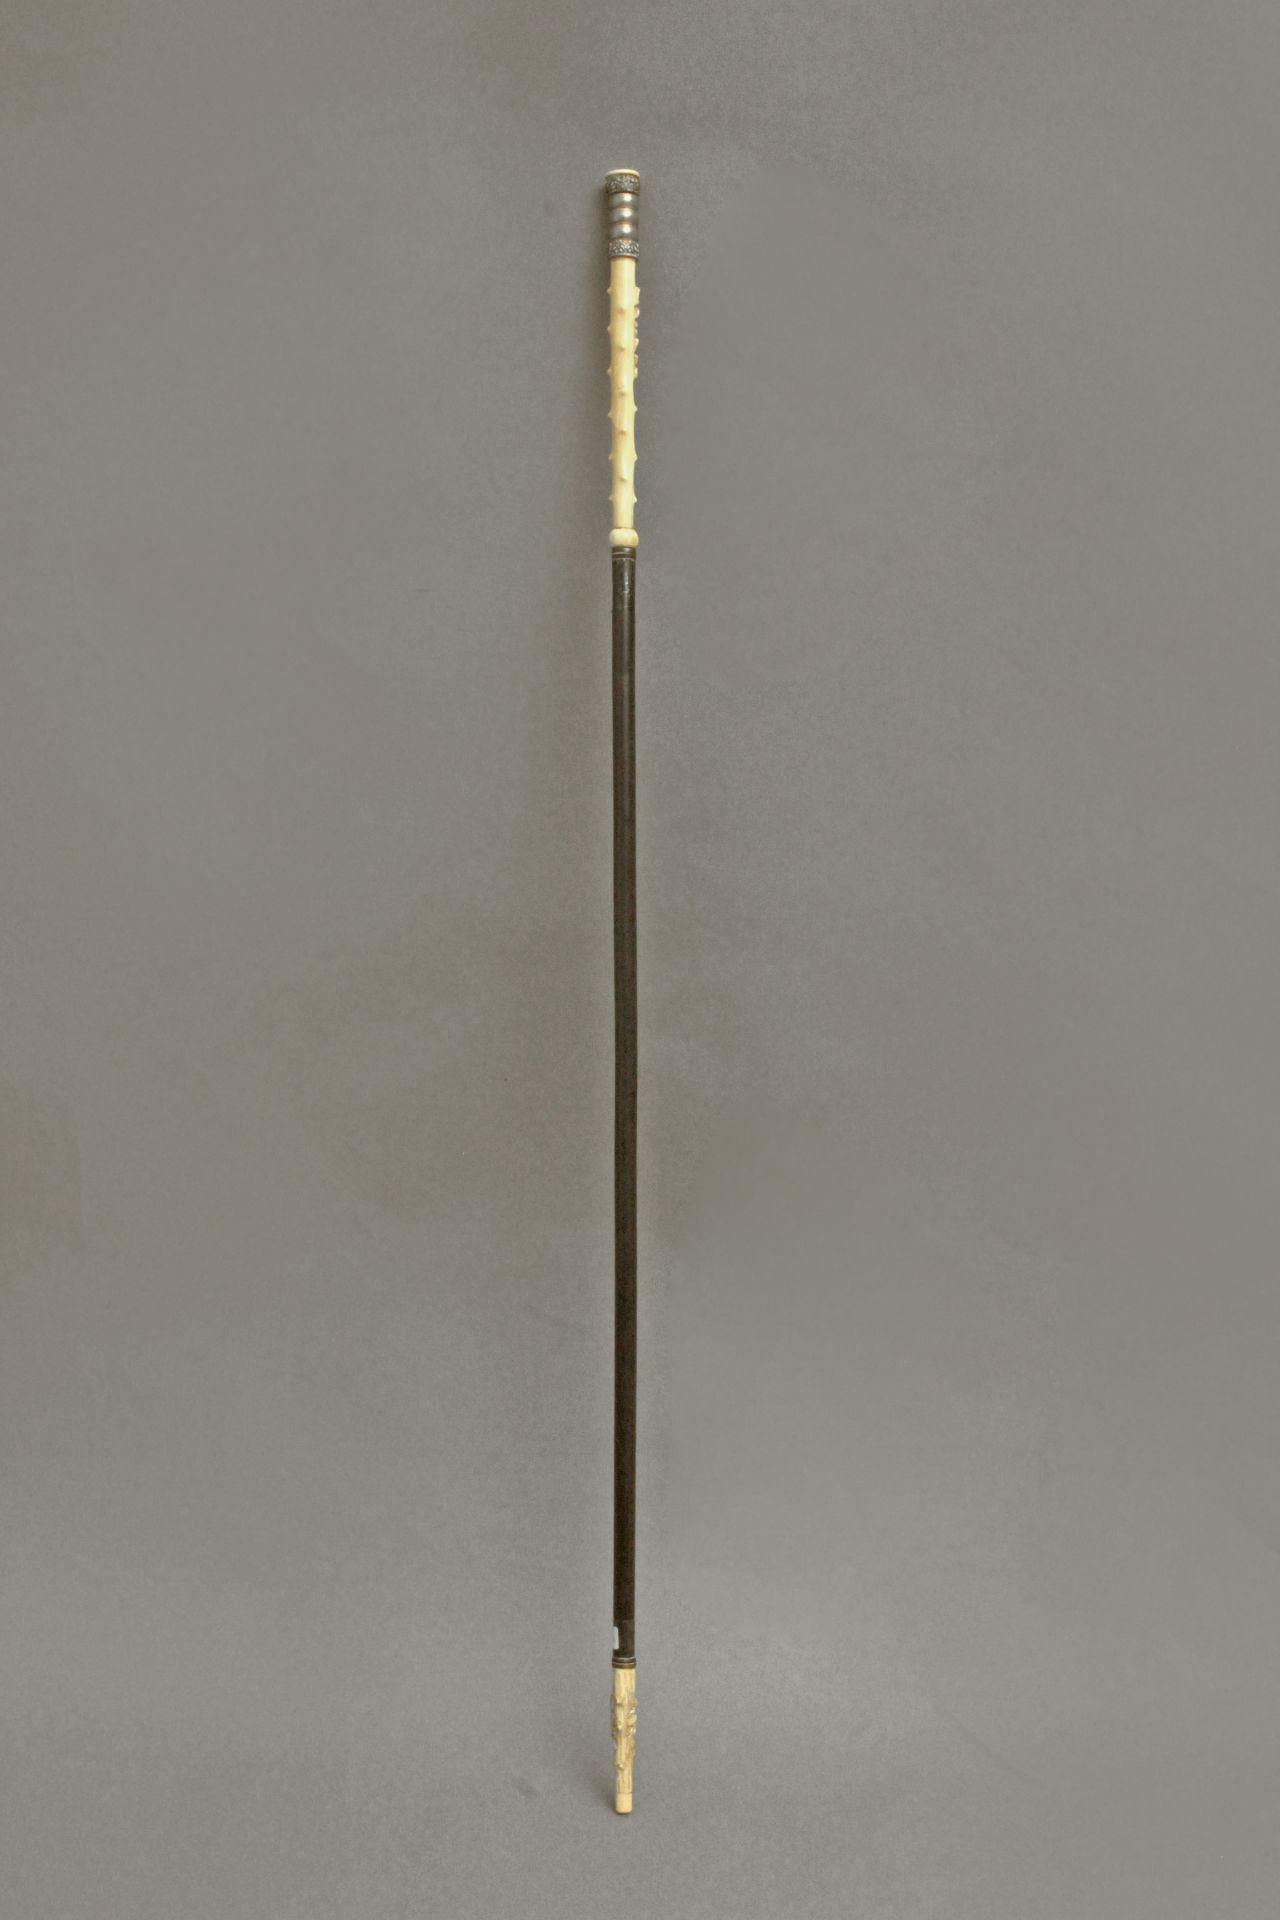 An ivory handled walking stick circa 1900 - Bild 8 aus 9